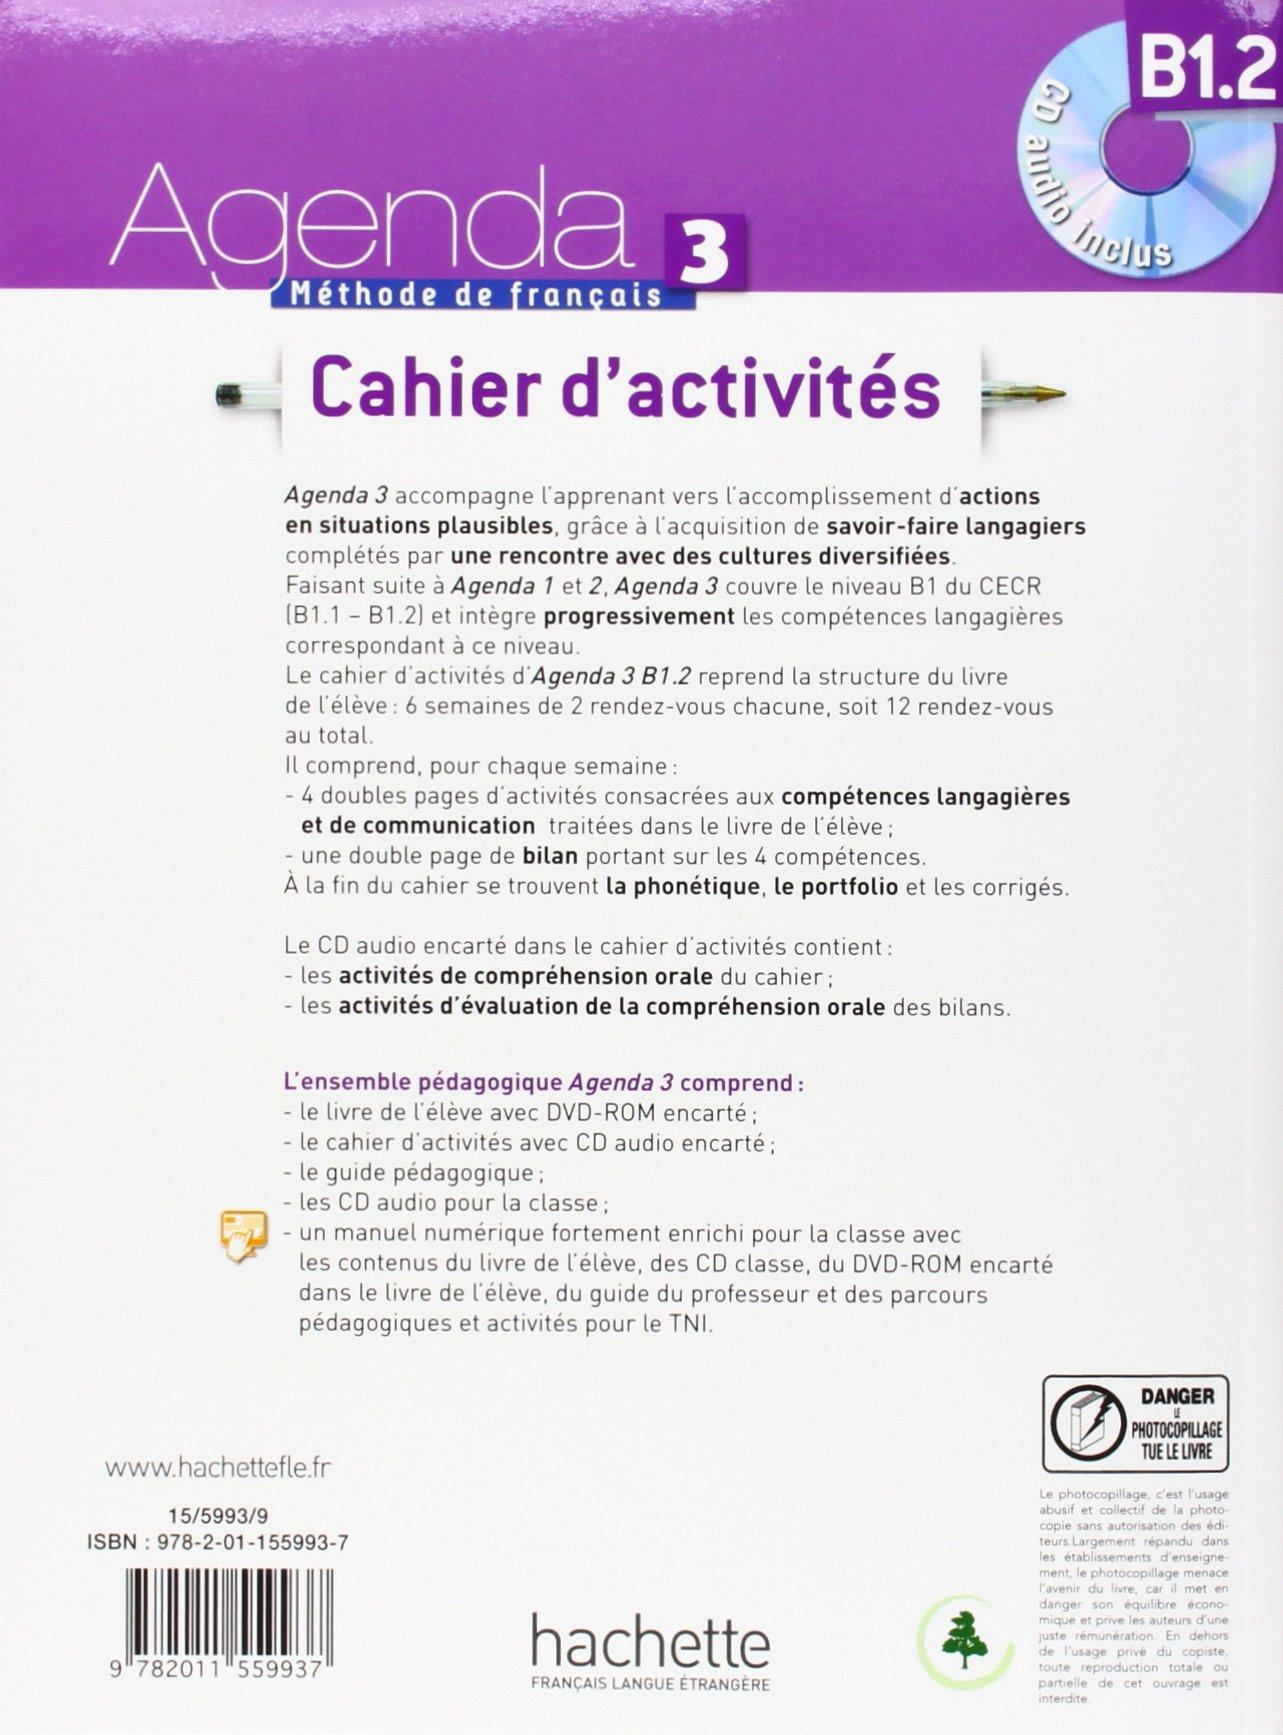 Agenda 3. Niveau B1. 2. Cahier DActivités: Amazon.es: Vv.Aa ...